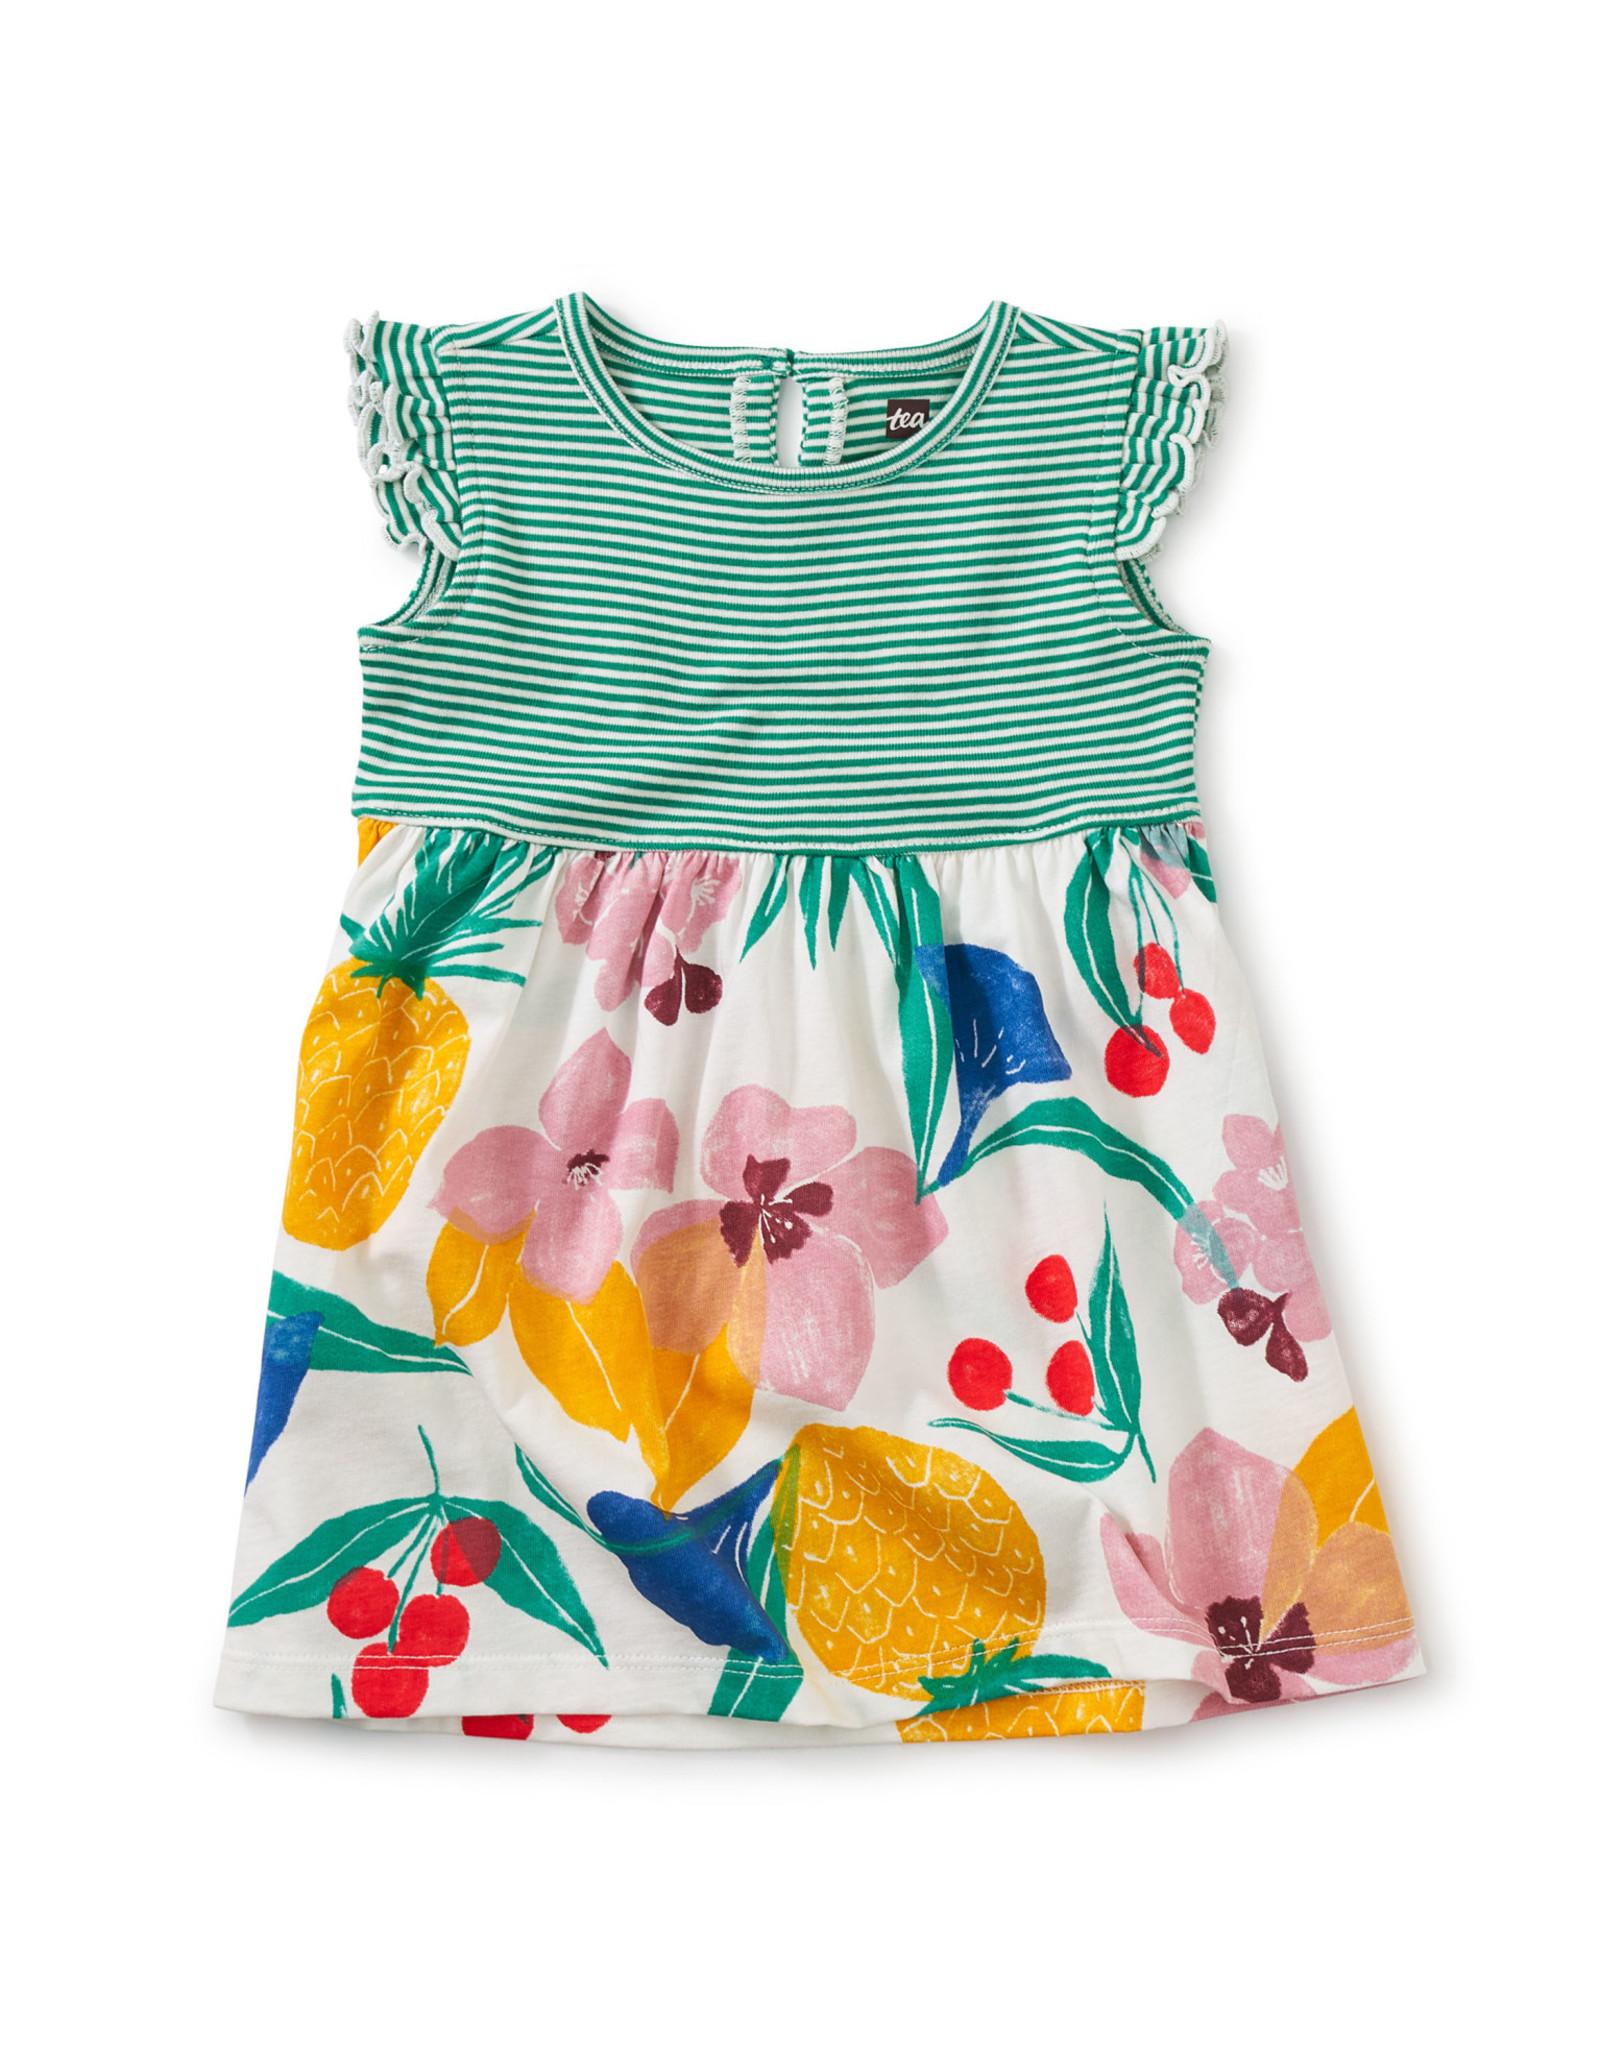 Tea Print Mix Ruffle Baby Dress, Fruity Floral